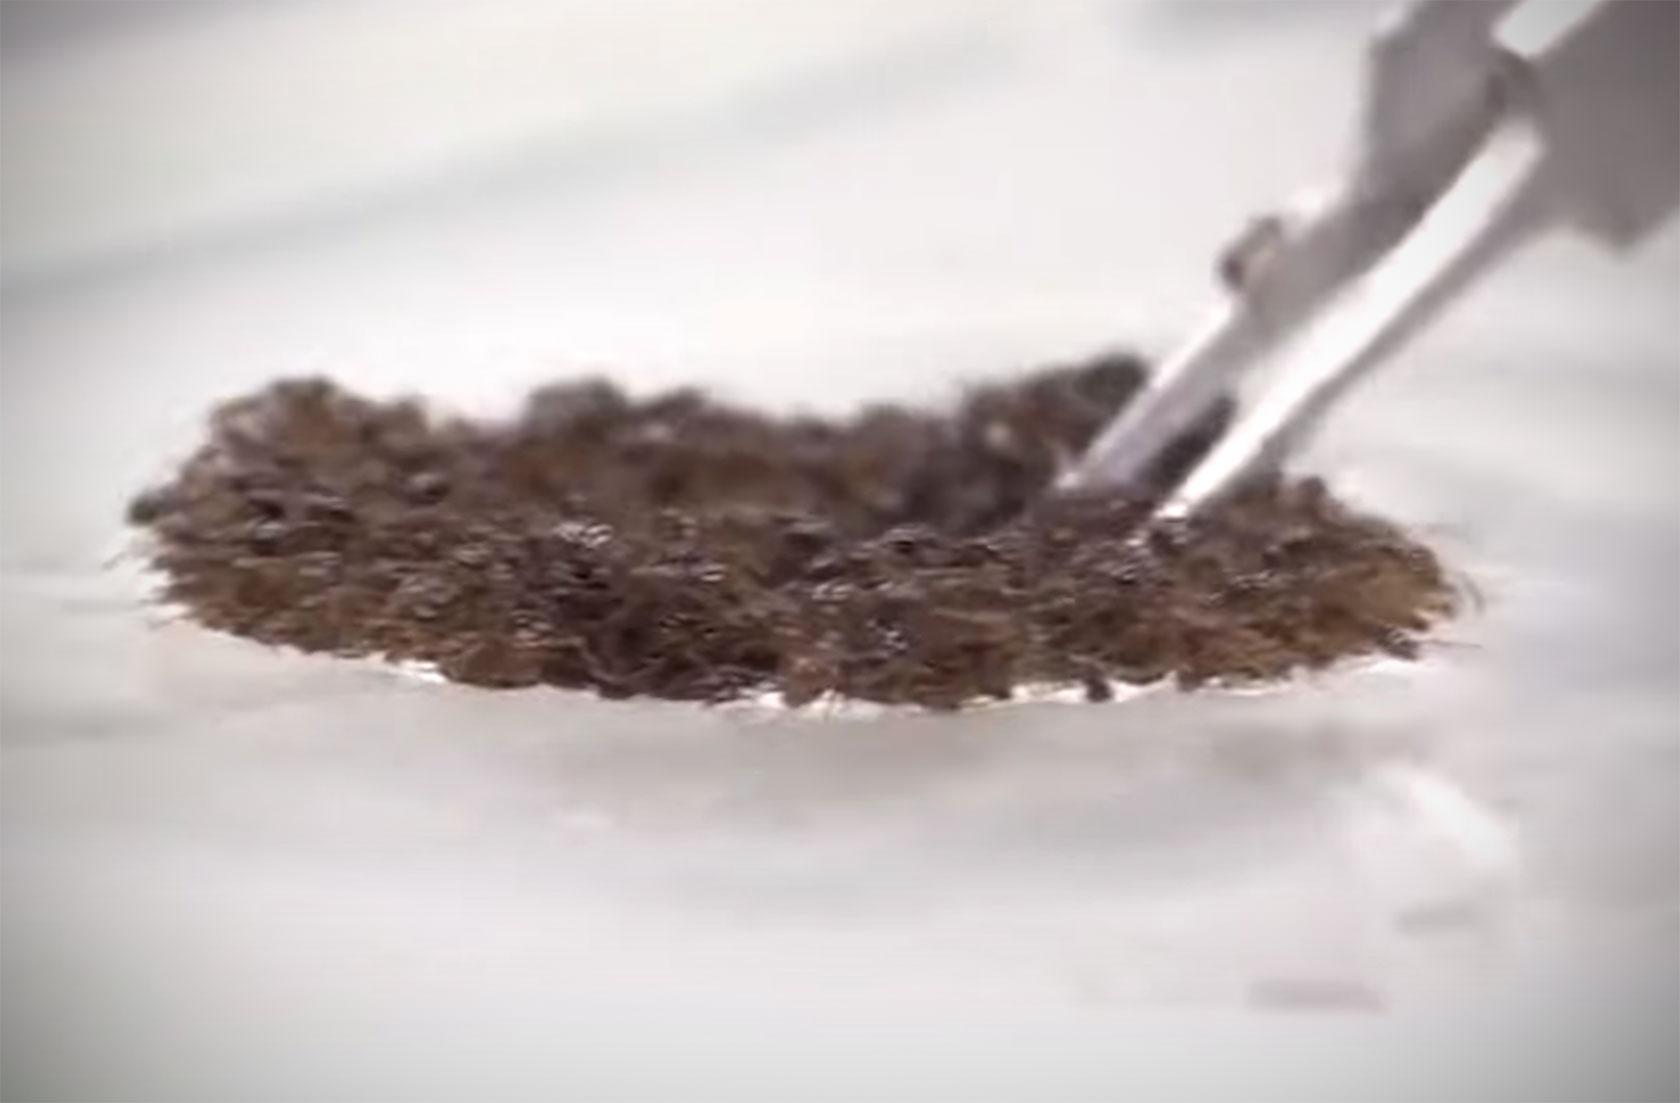 Fire Ants Shape-Shifting Unsinkable Raft